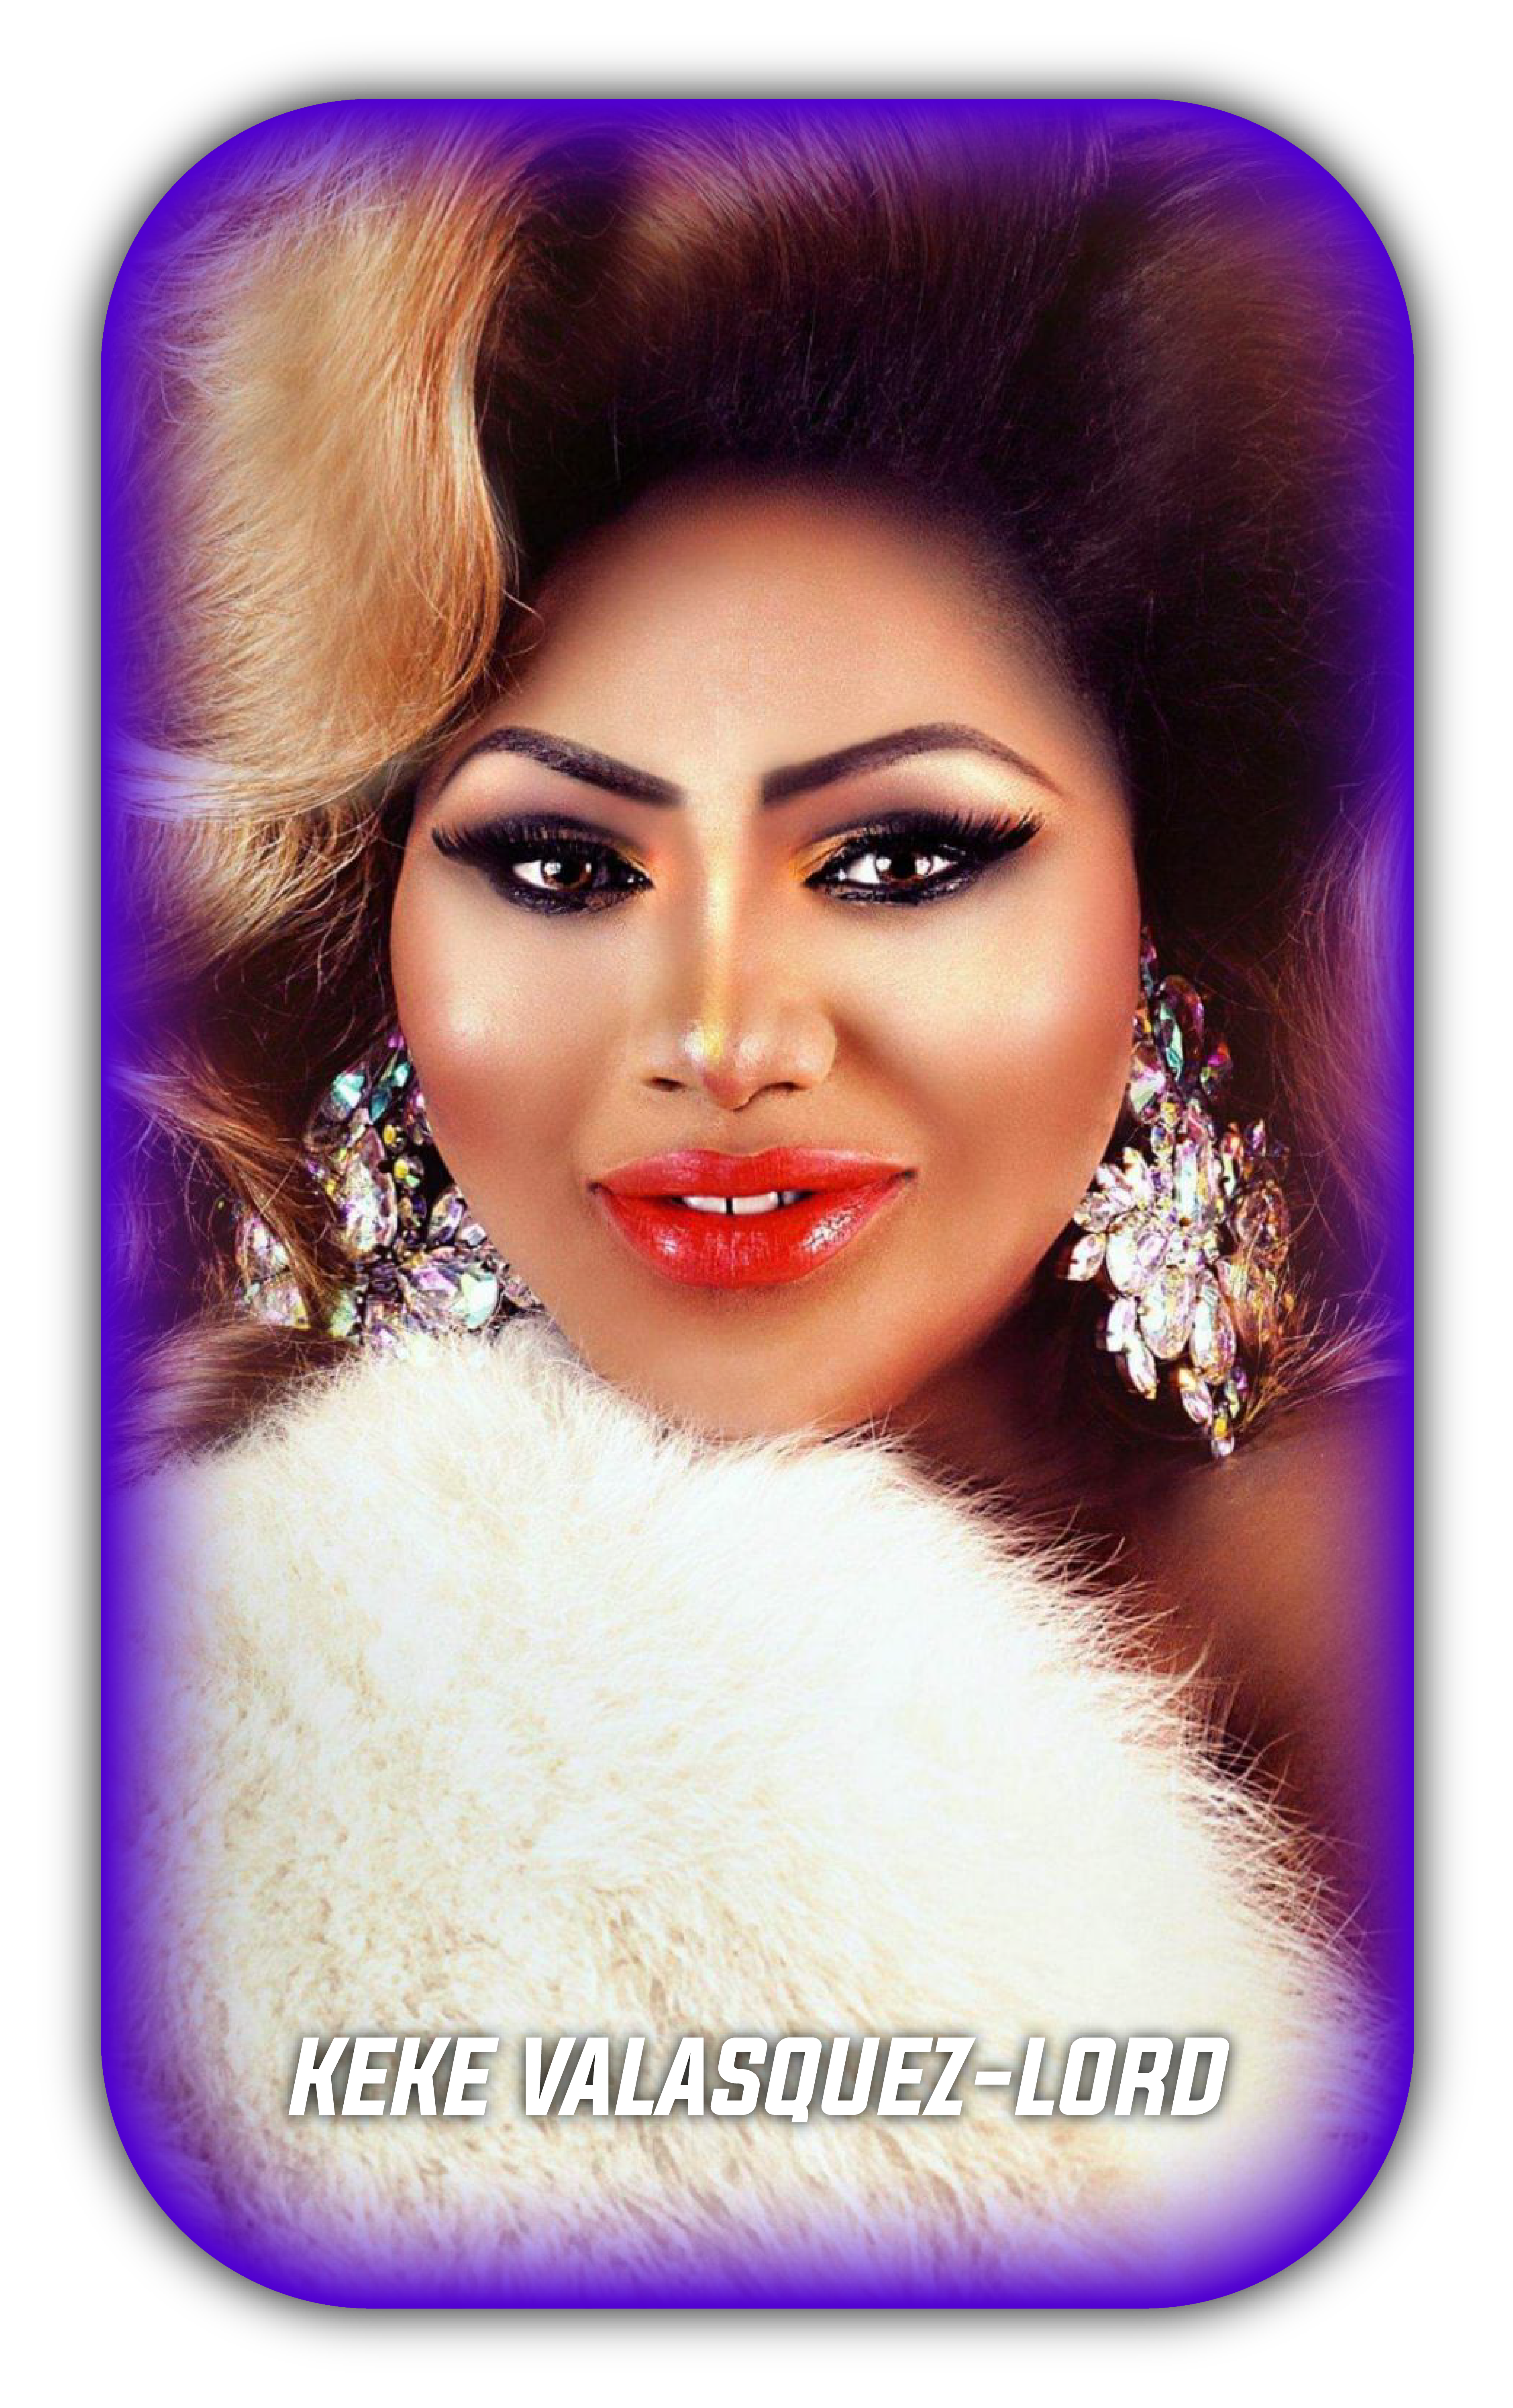 19 - Queen Profile (KEKE) 02